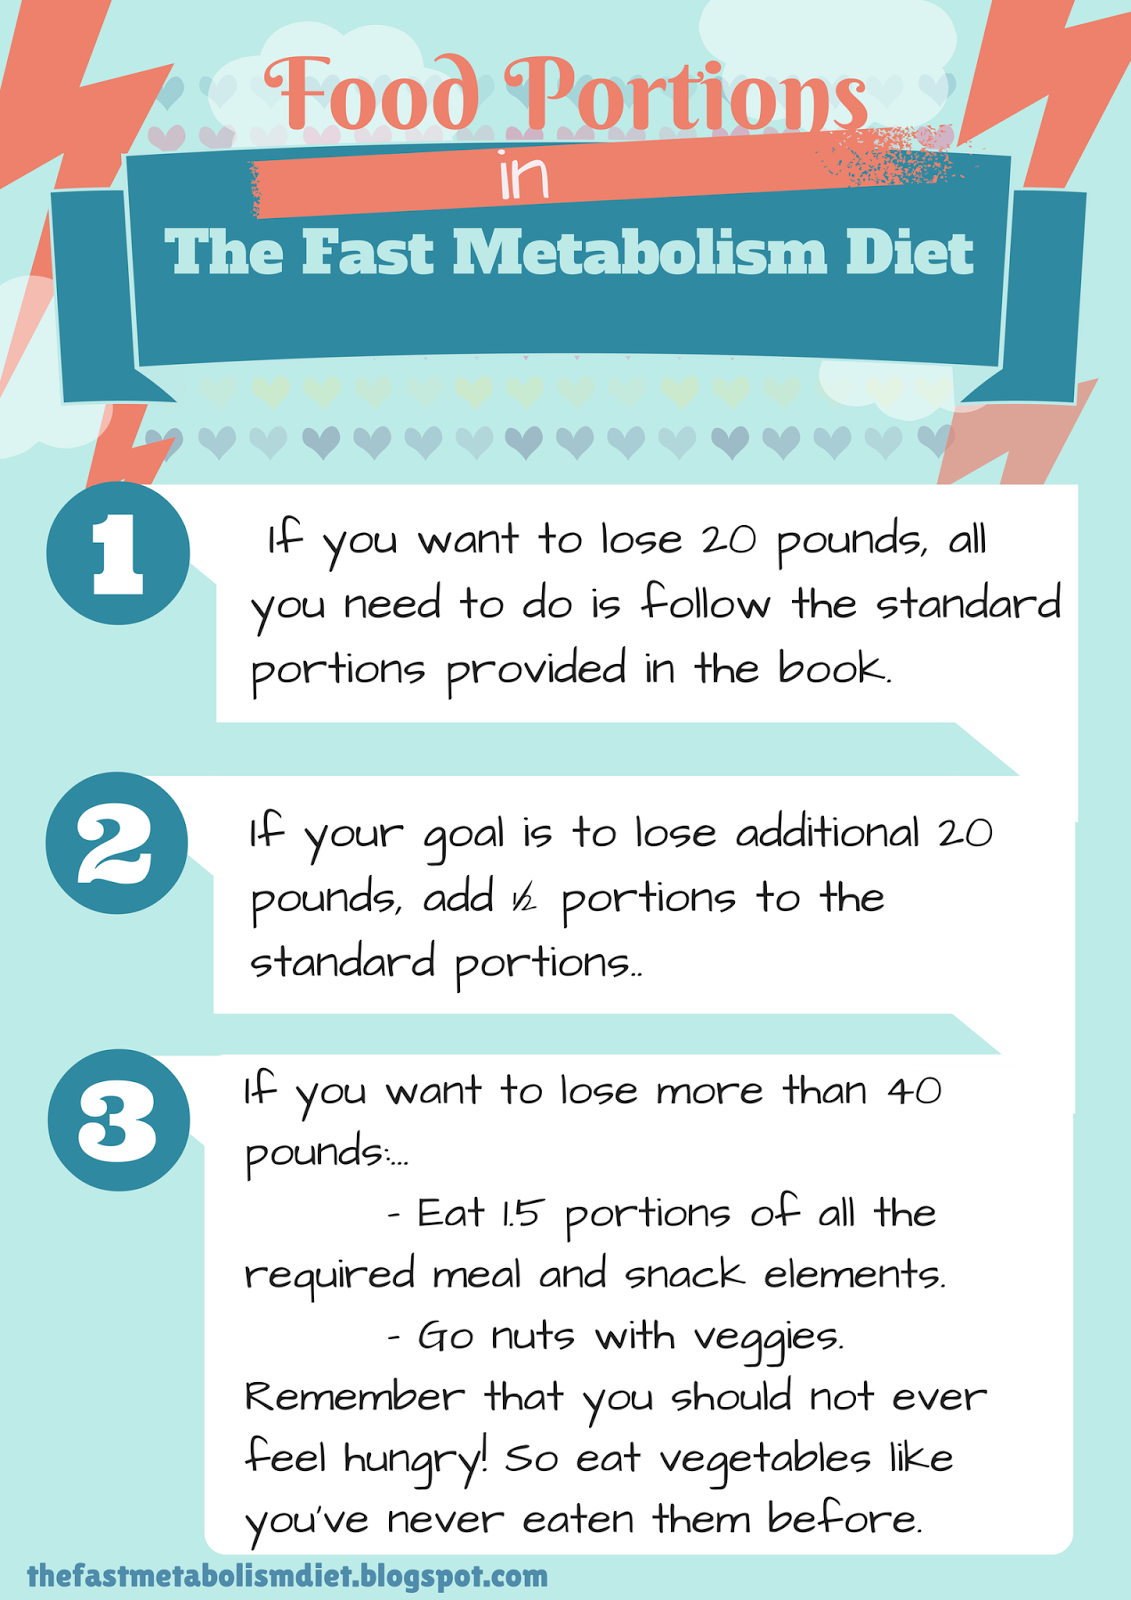 Fast metabolism diet reviews - Food Portions In The Fast Metabolism Diet Thefastmetabolismdiet Fmdfoodportions